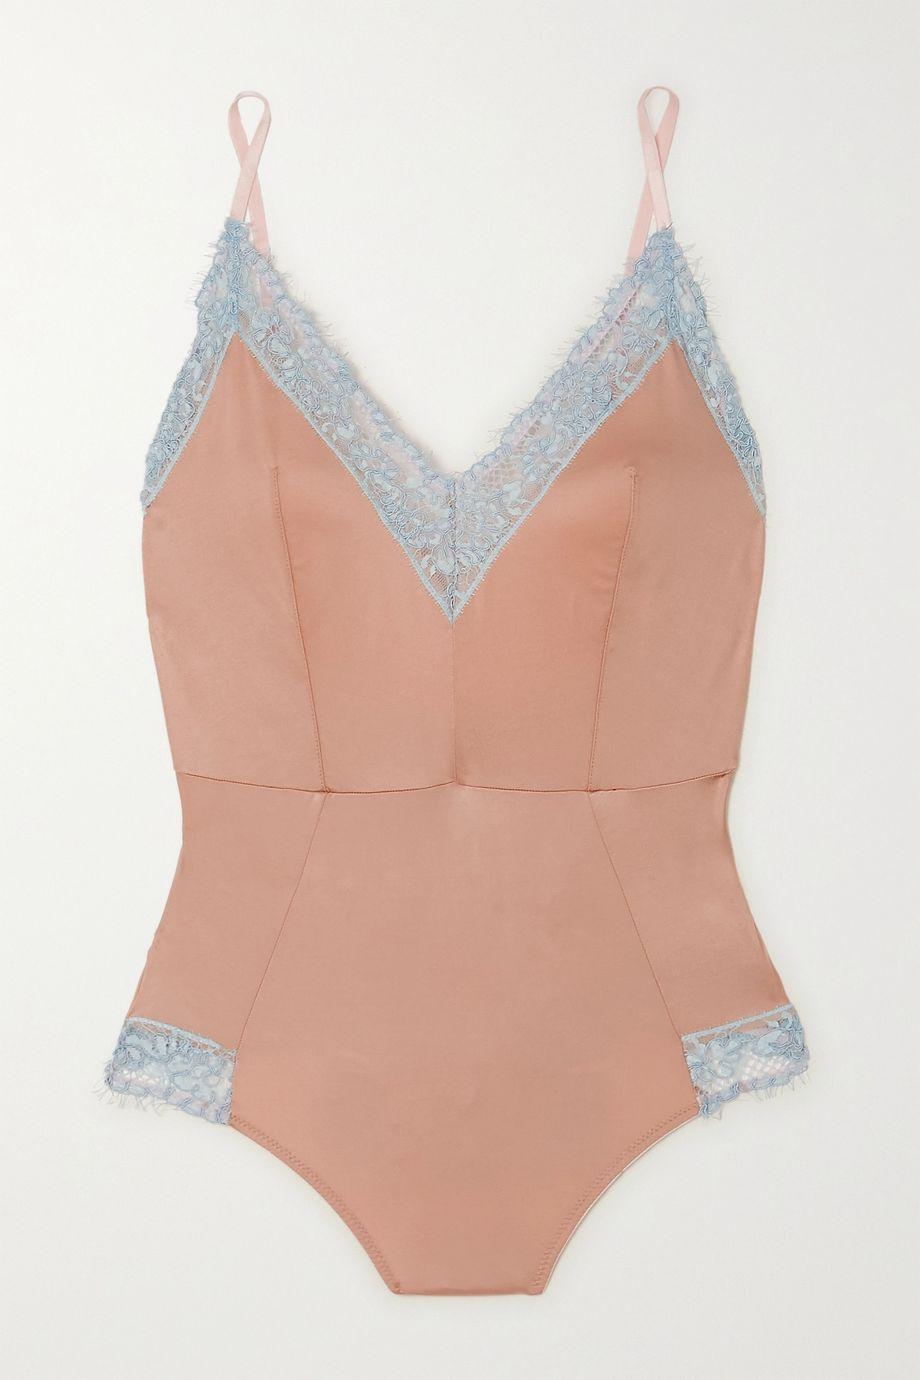 Dora Larsen Ottalie corded lace-trimmed satin-jersey bodysuit